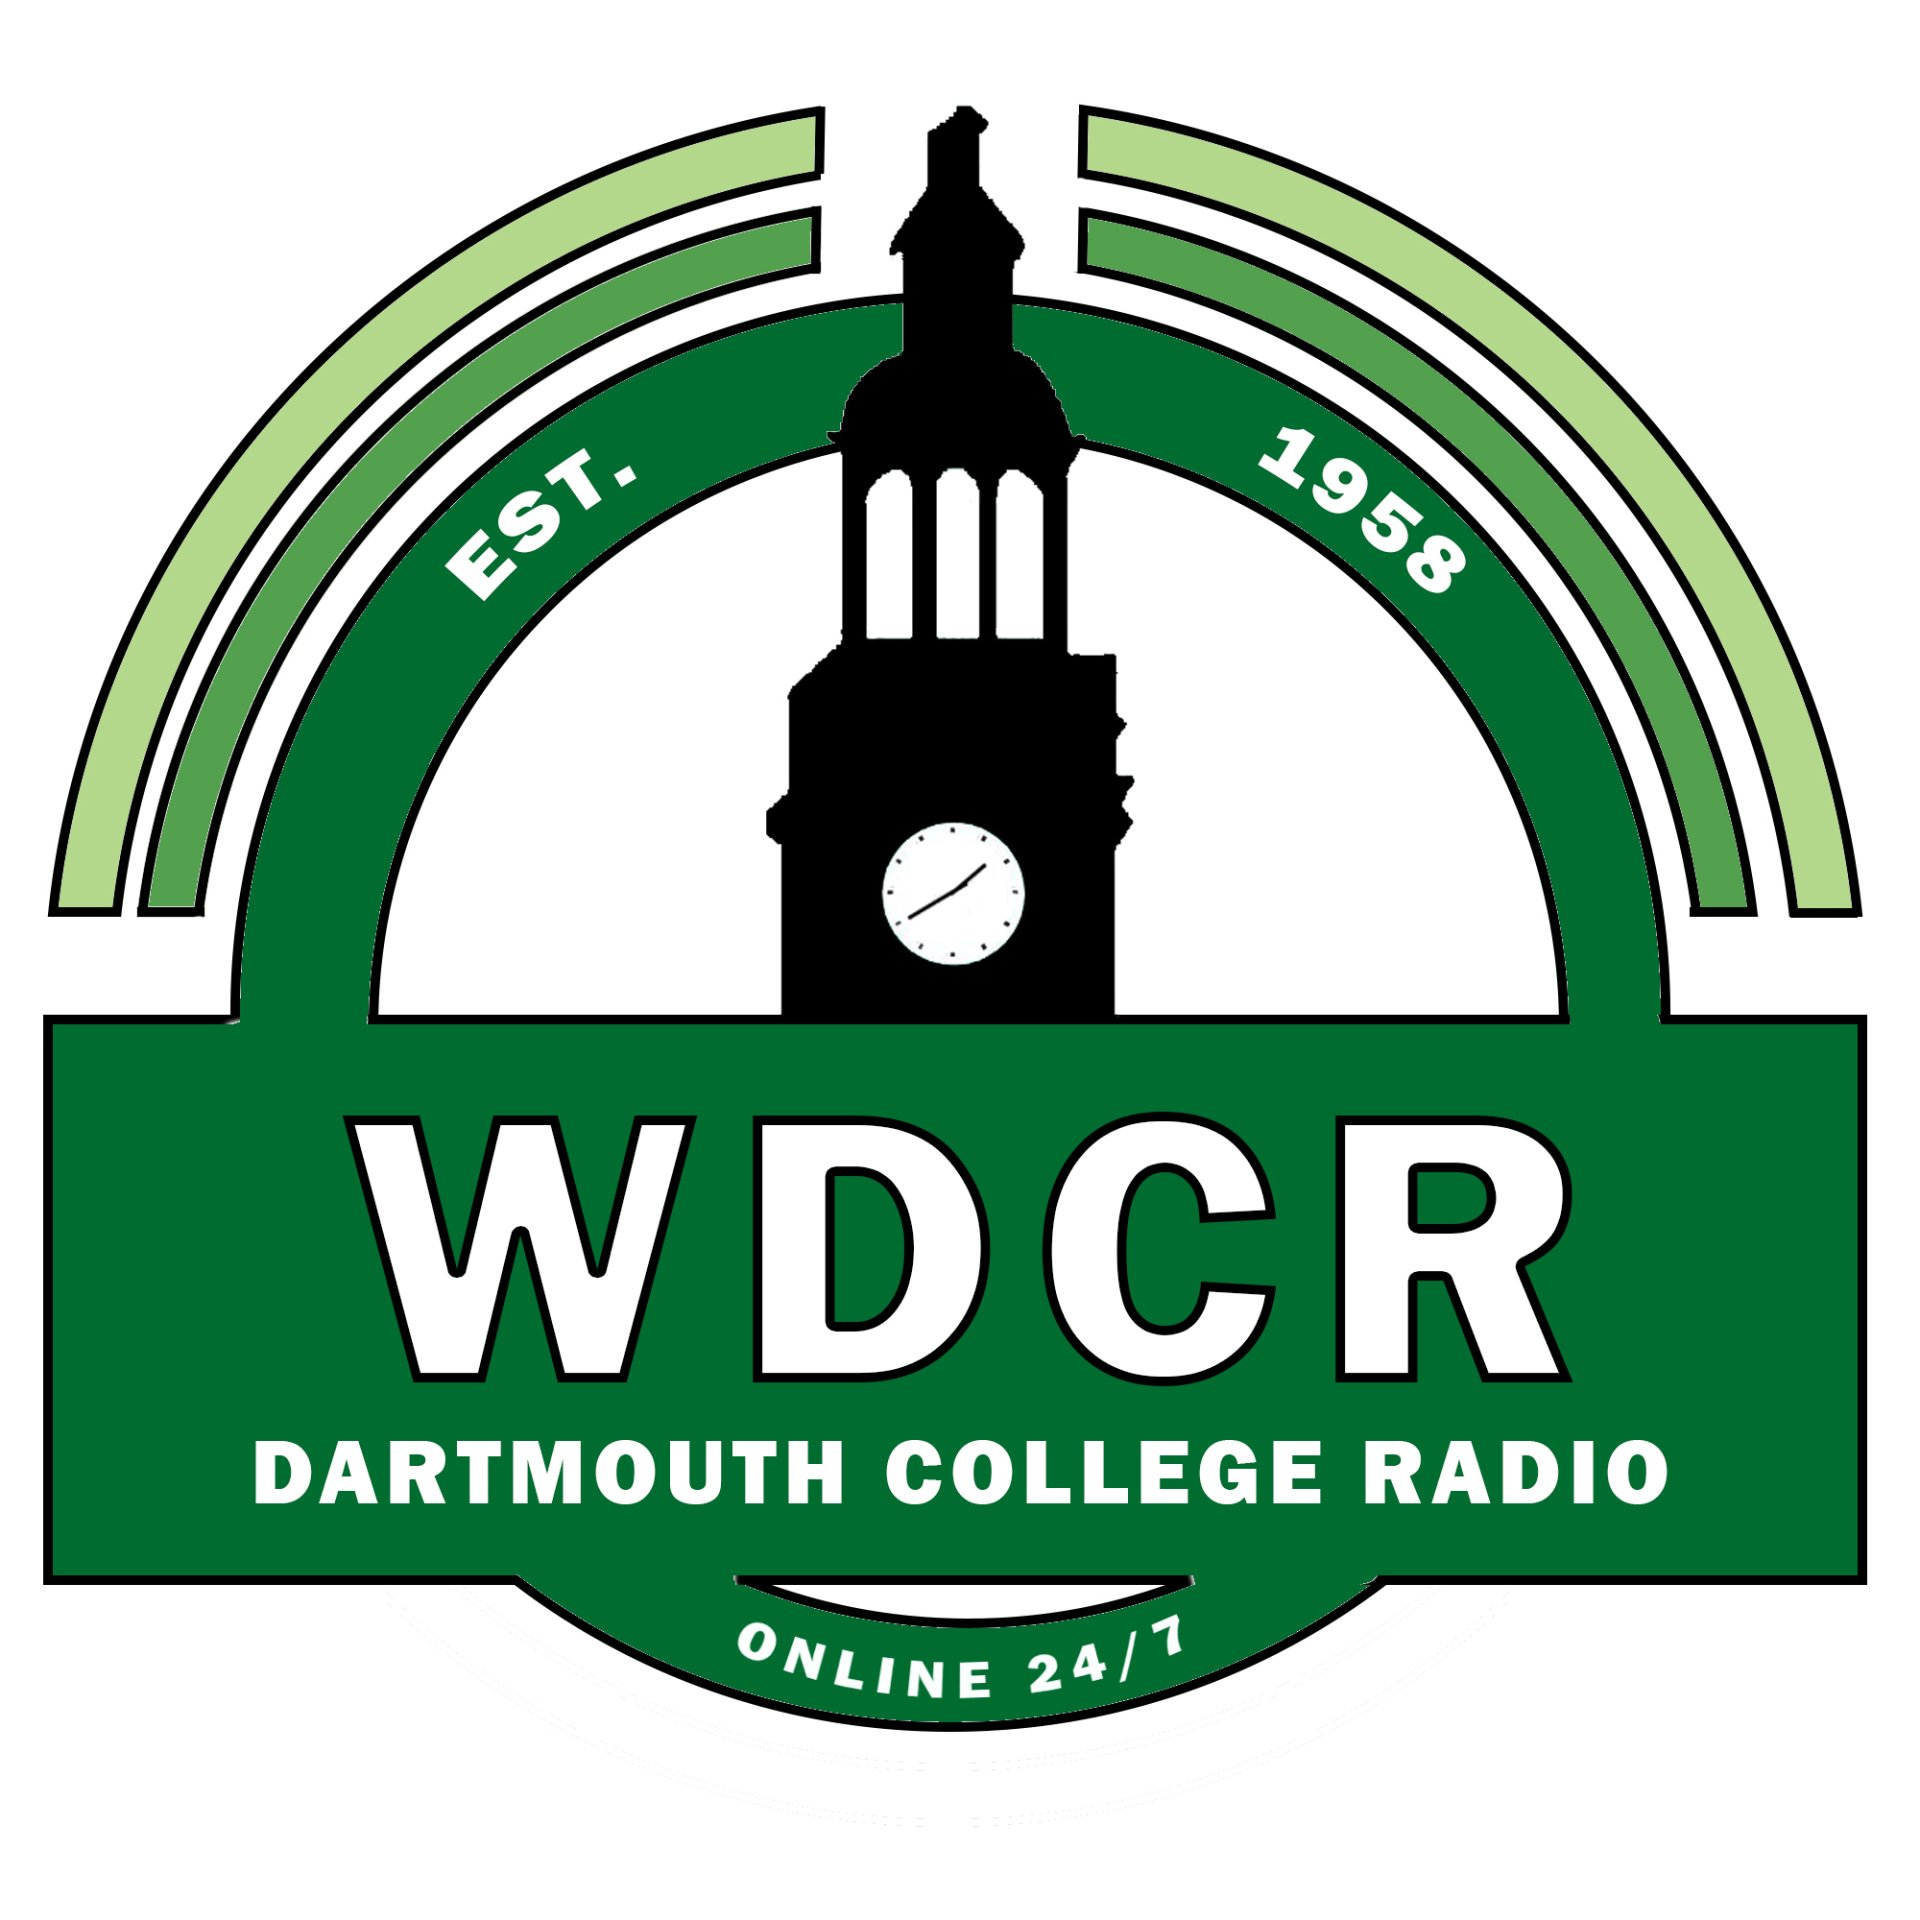 WDCR-WebDCR Dartmouth College Radio